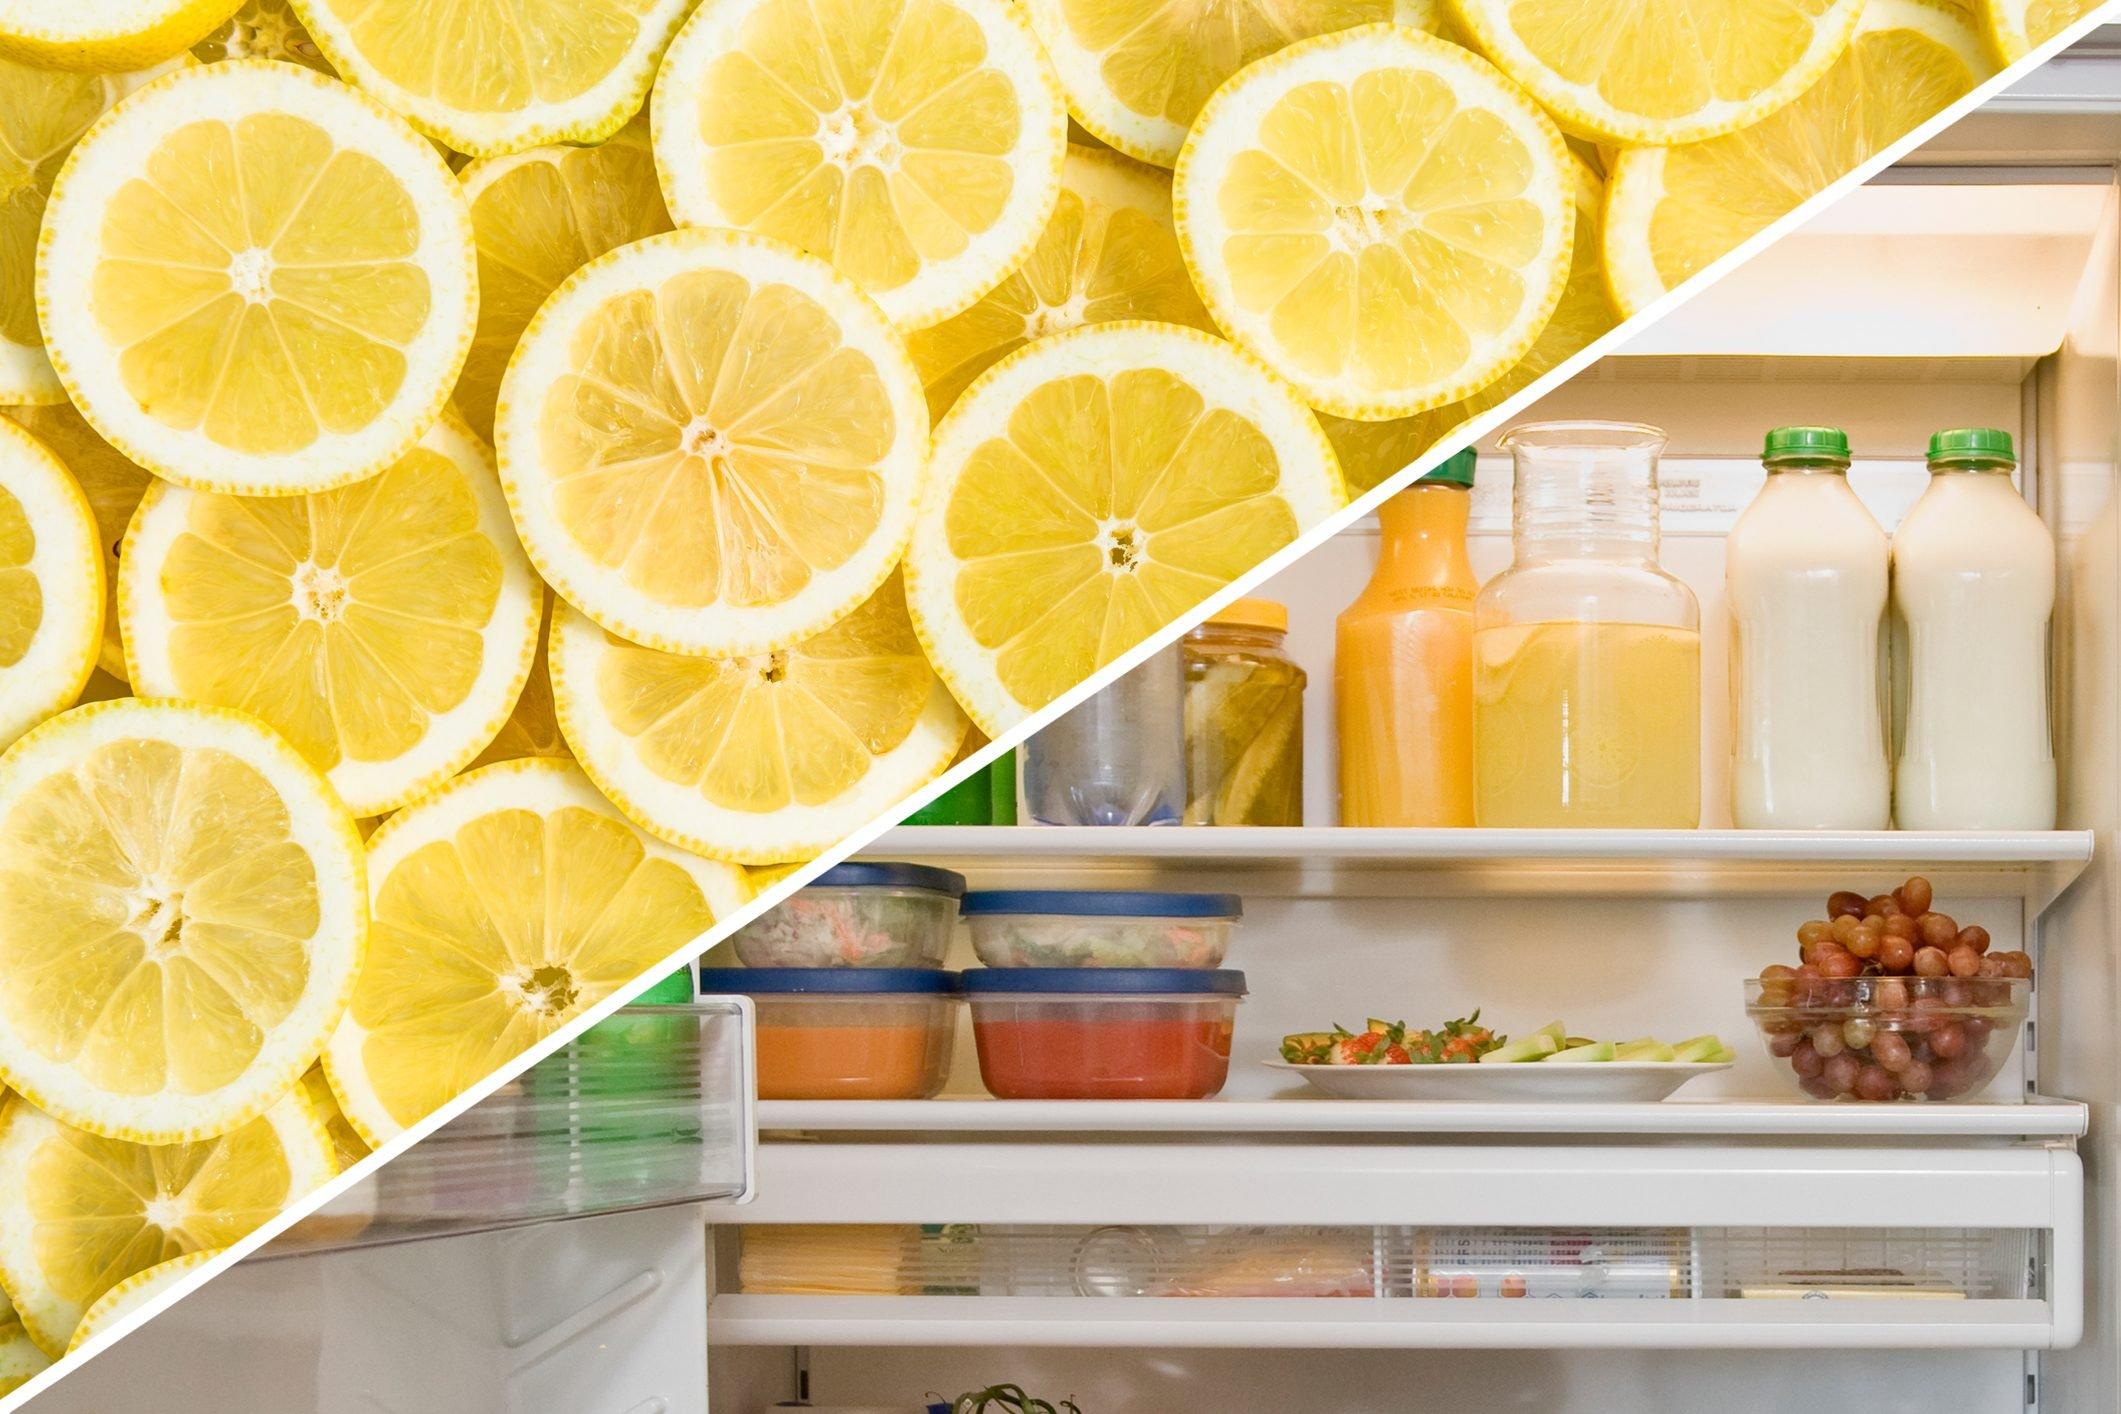 refrigerator clean lemon